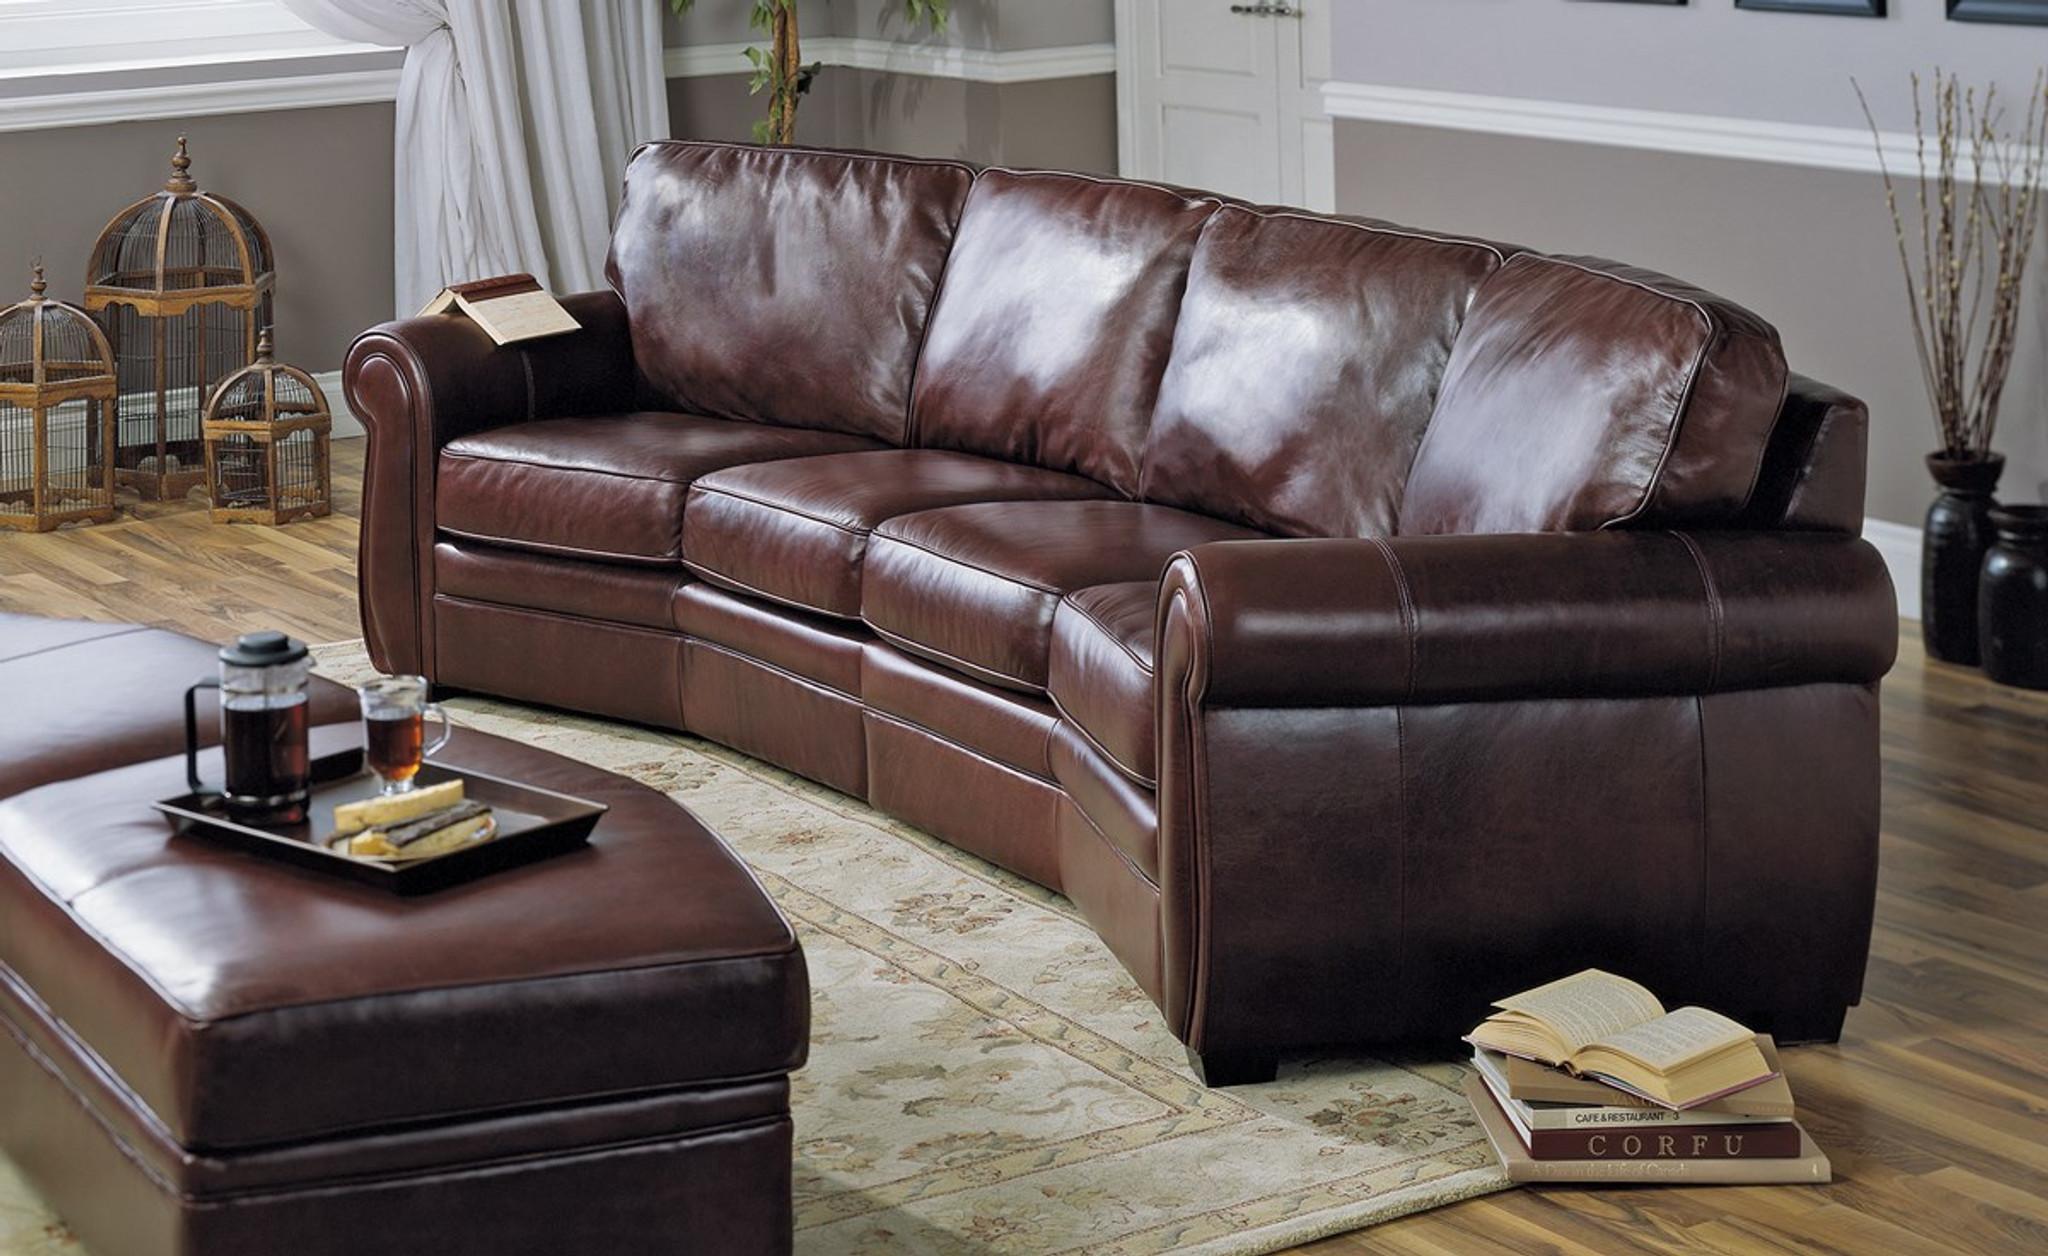 Palliser Leather Sofa Sectional Model 77492 Viceroy